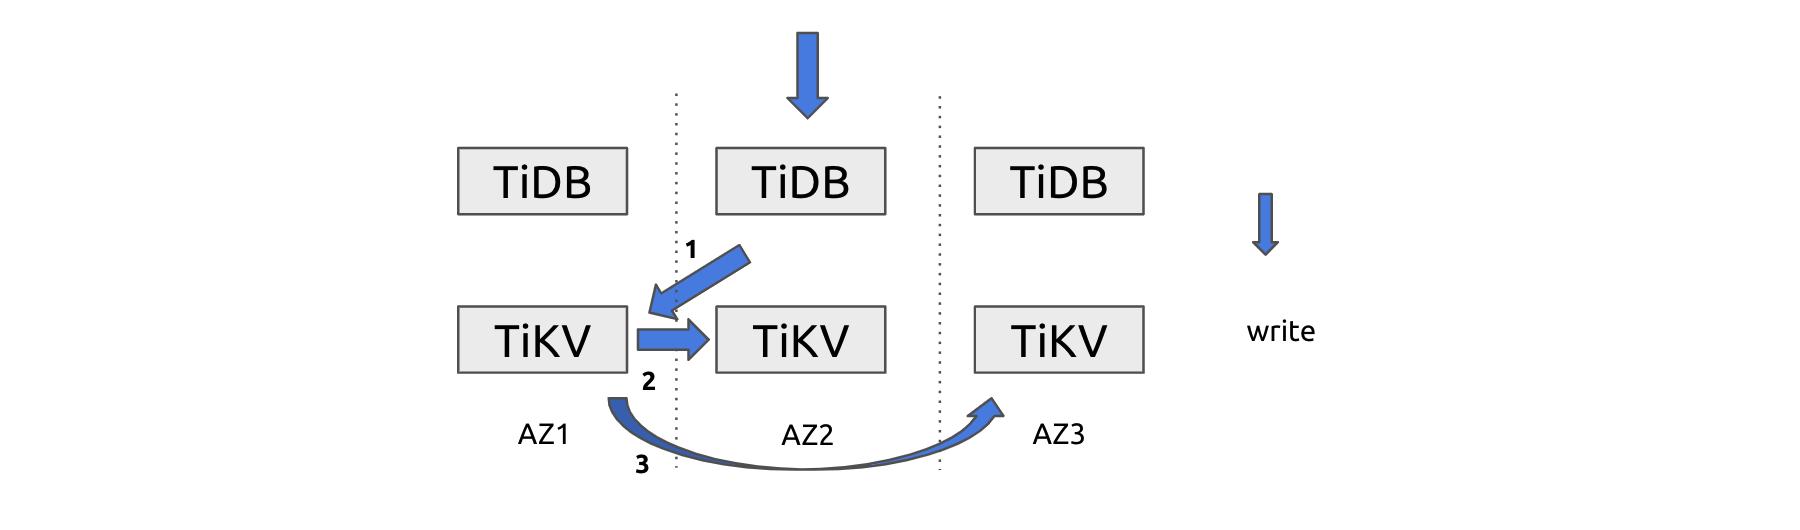 A cross-AZ write operation